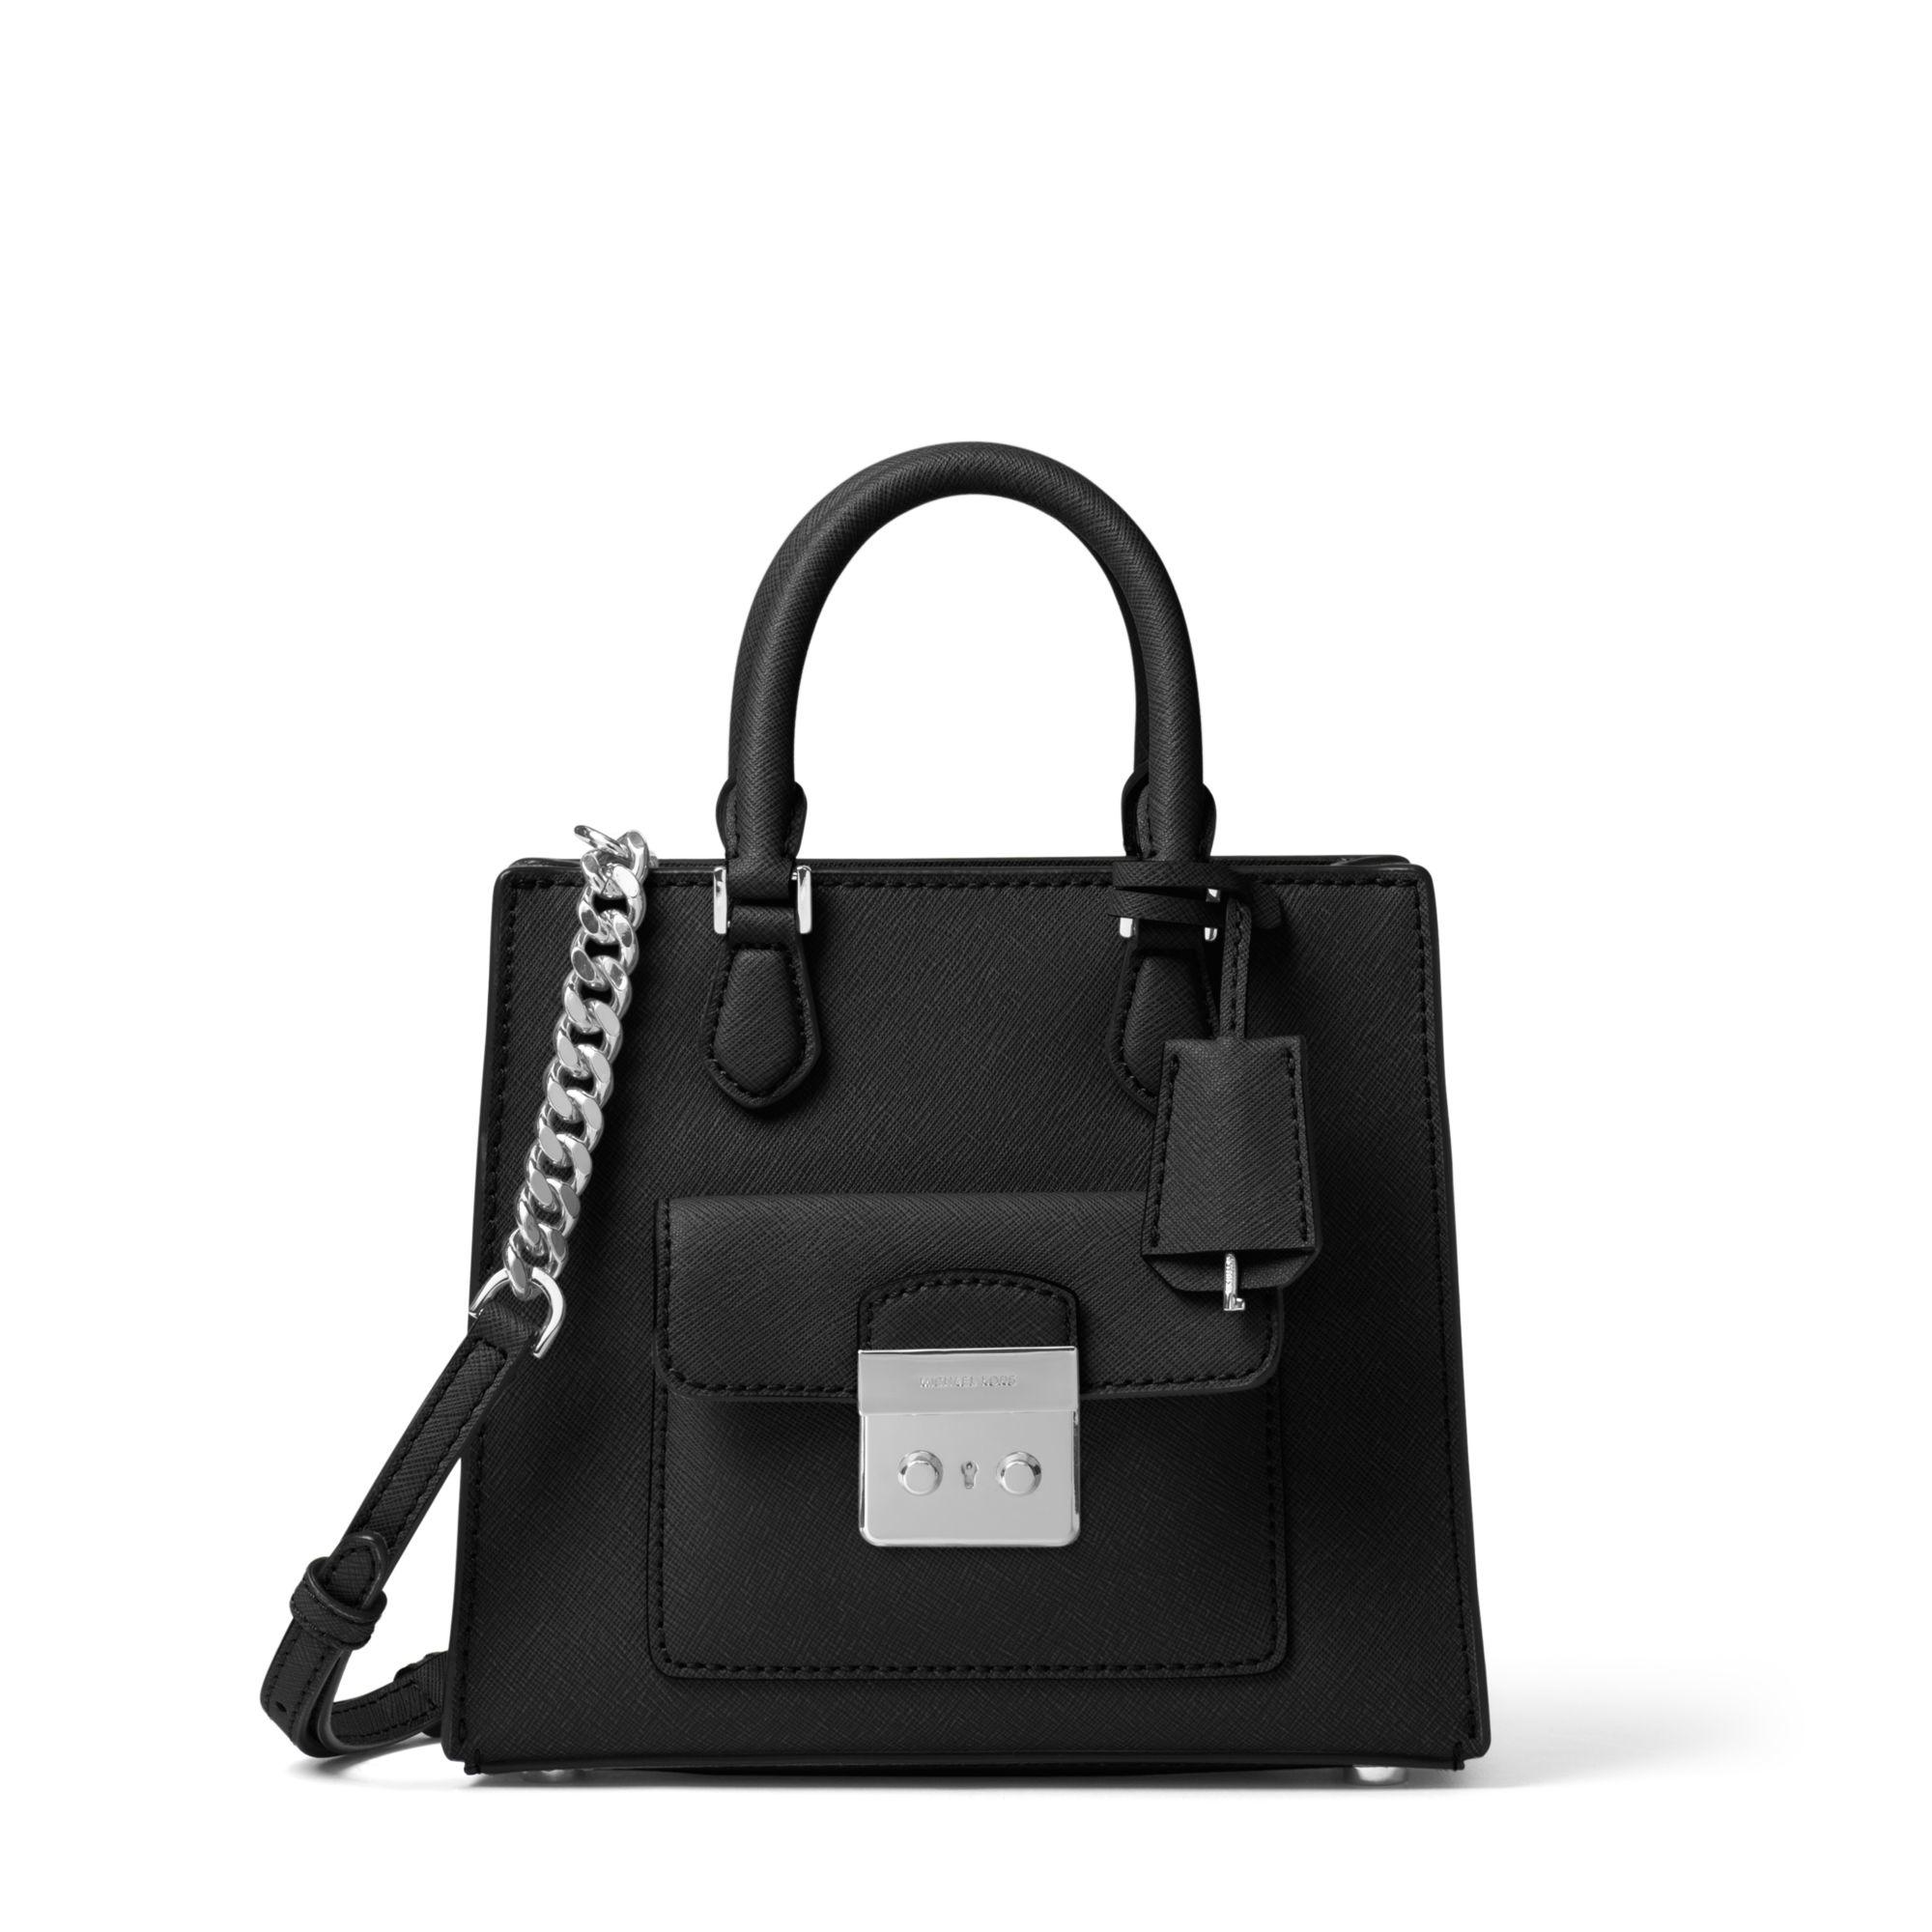 11a94ae2d603 Michael Kors Bridgette Small Saffiano Leather Crossbody Bag in Black ...